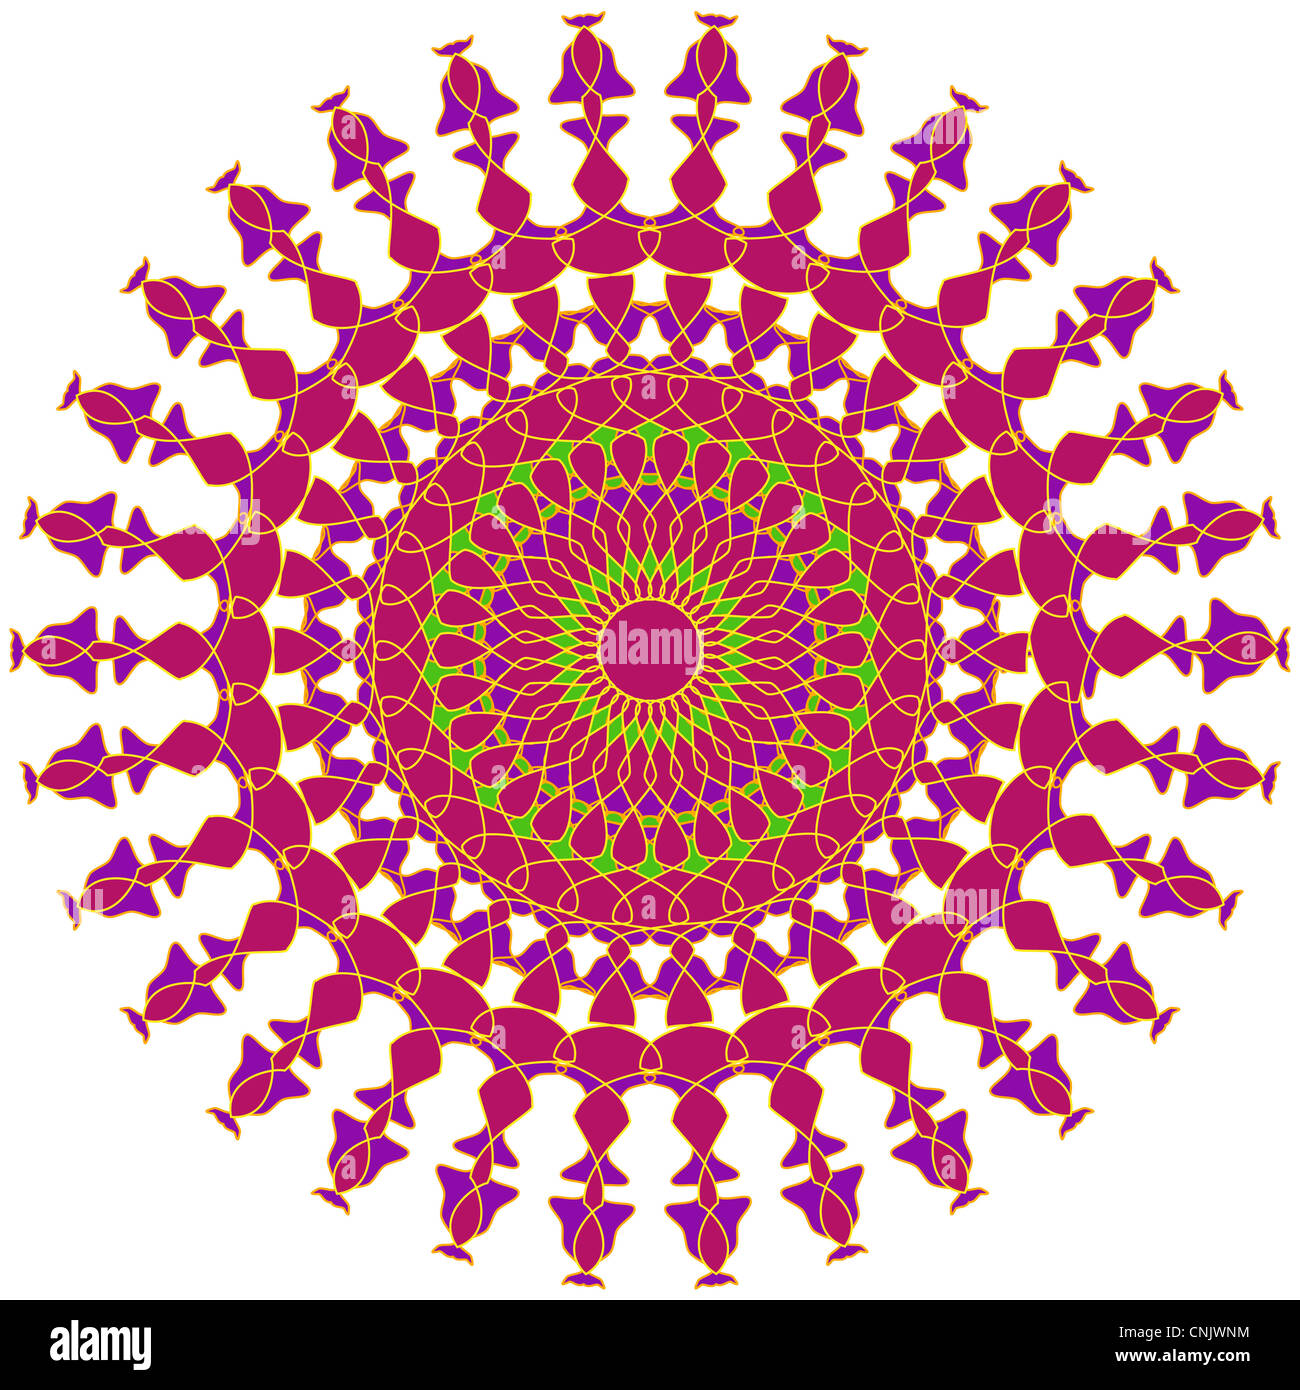 Artistic mandala design in pink and purple colors Stock Photo